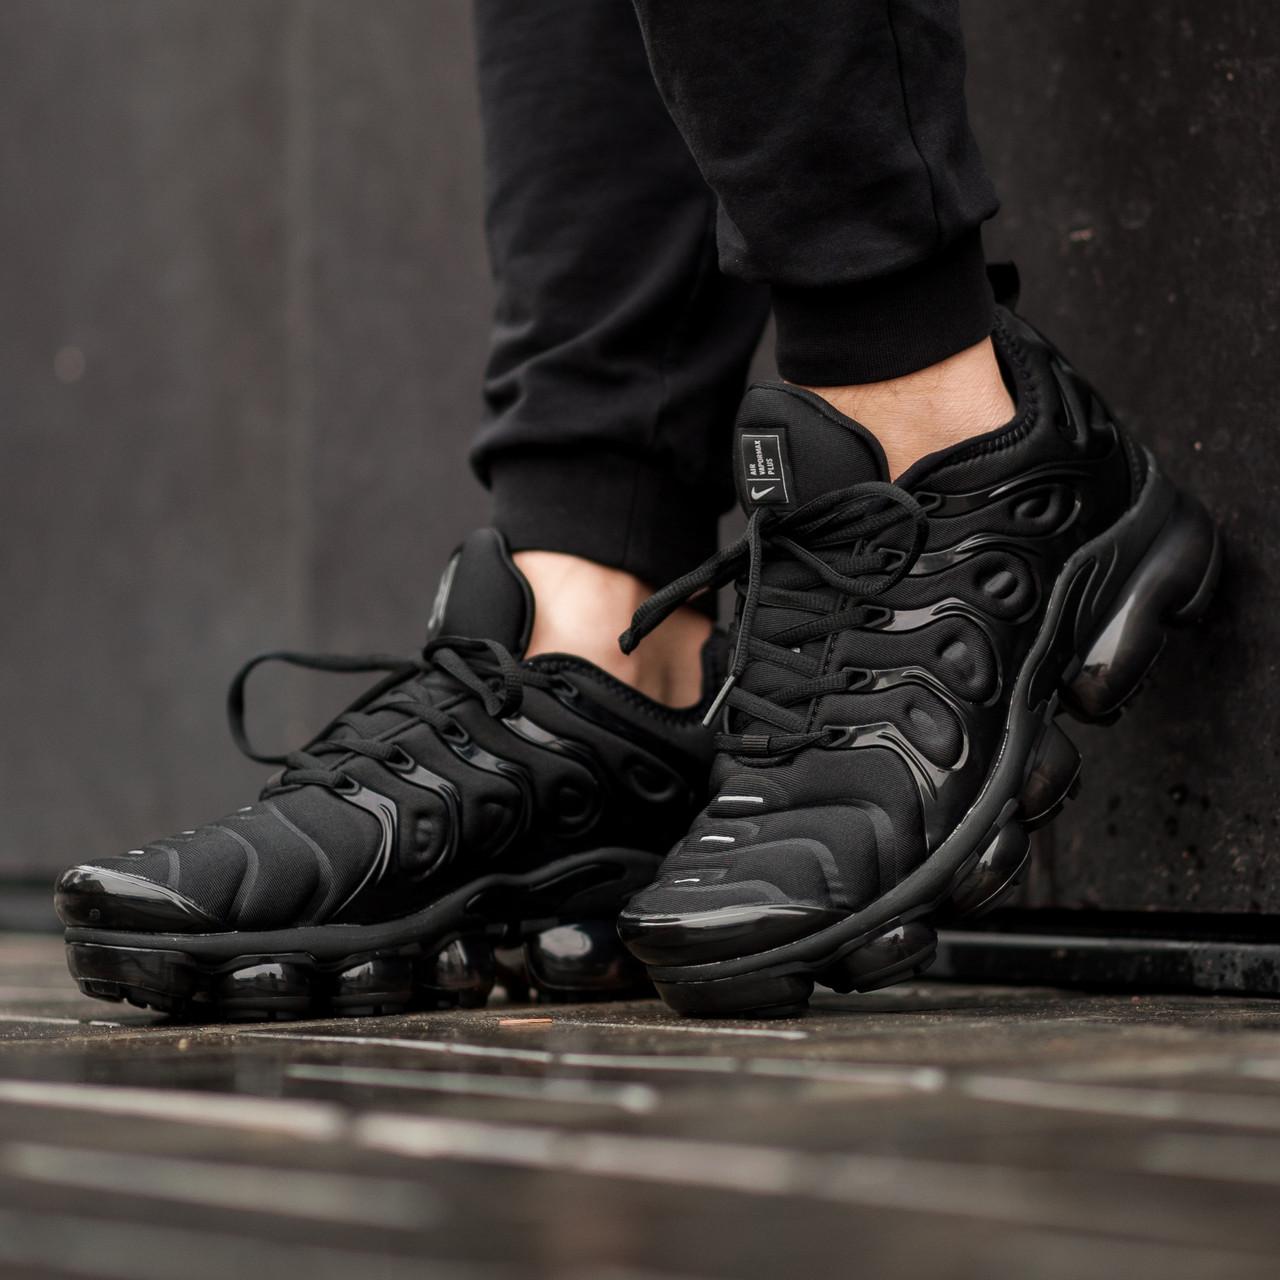 Мужские кроссовки в стиле Nike Air Vapormax Plus Black (Реплика ААА+)